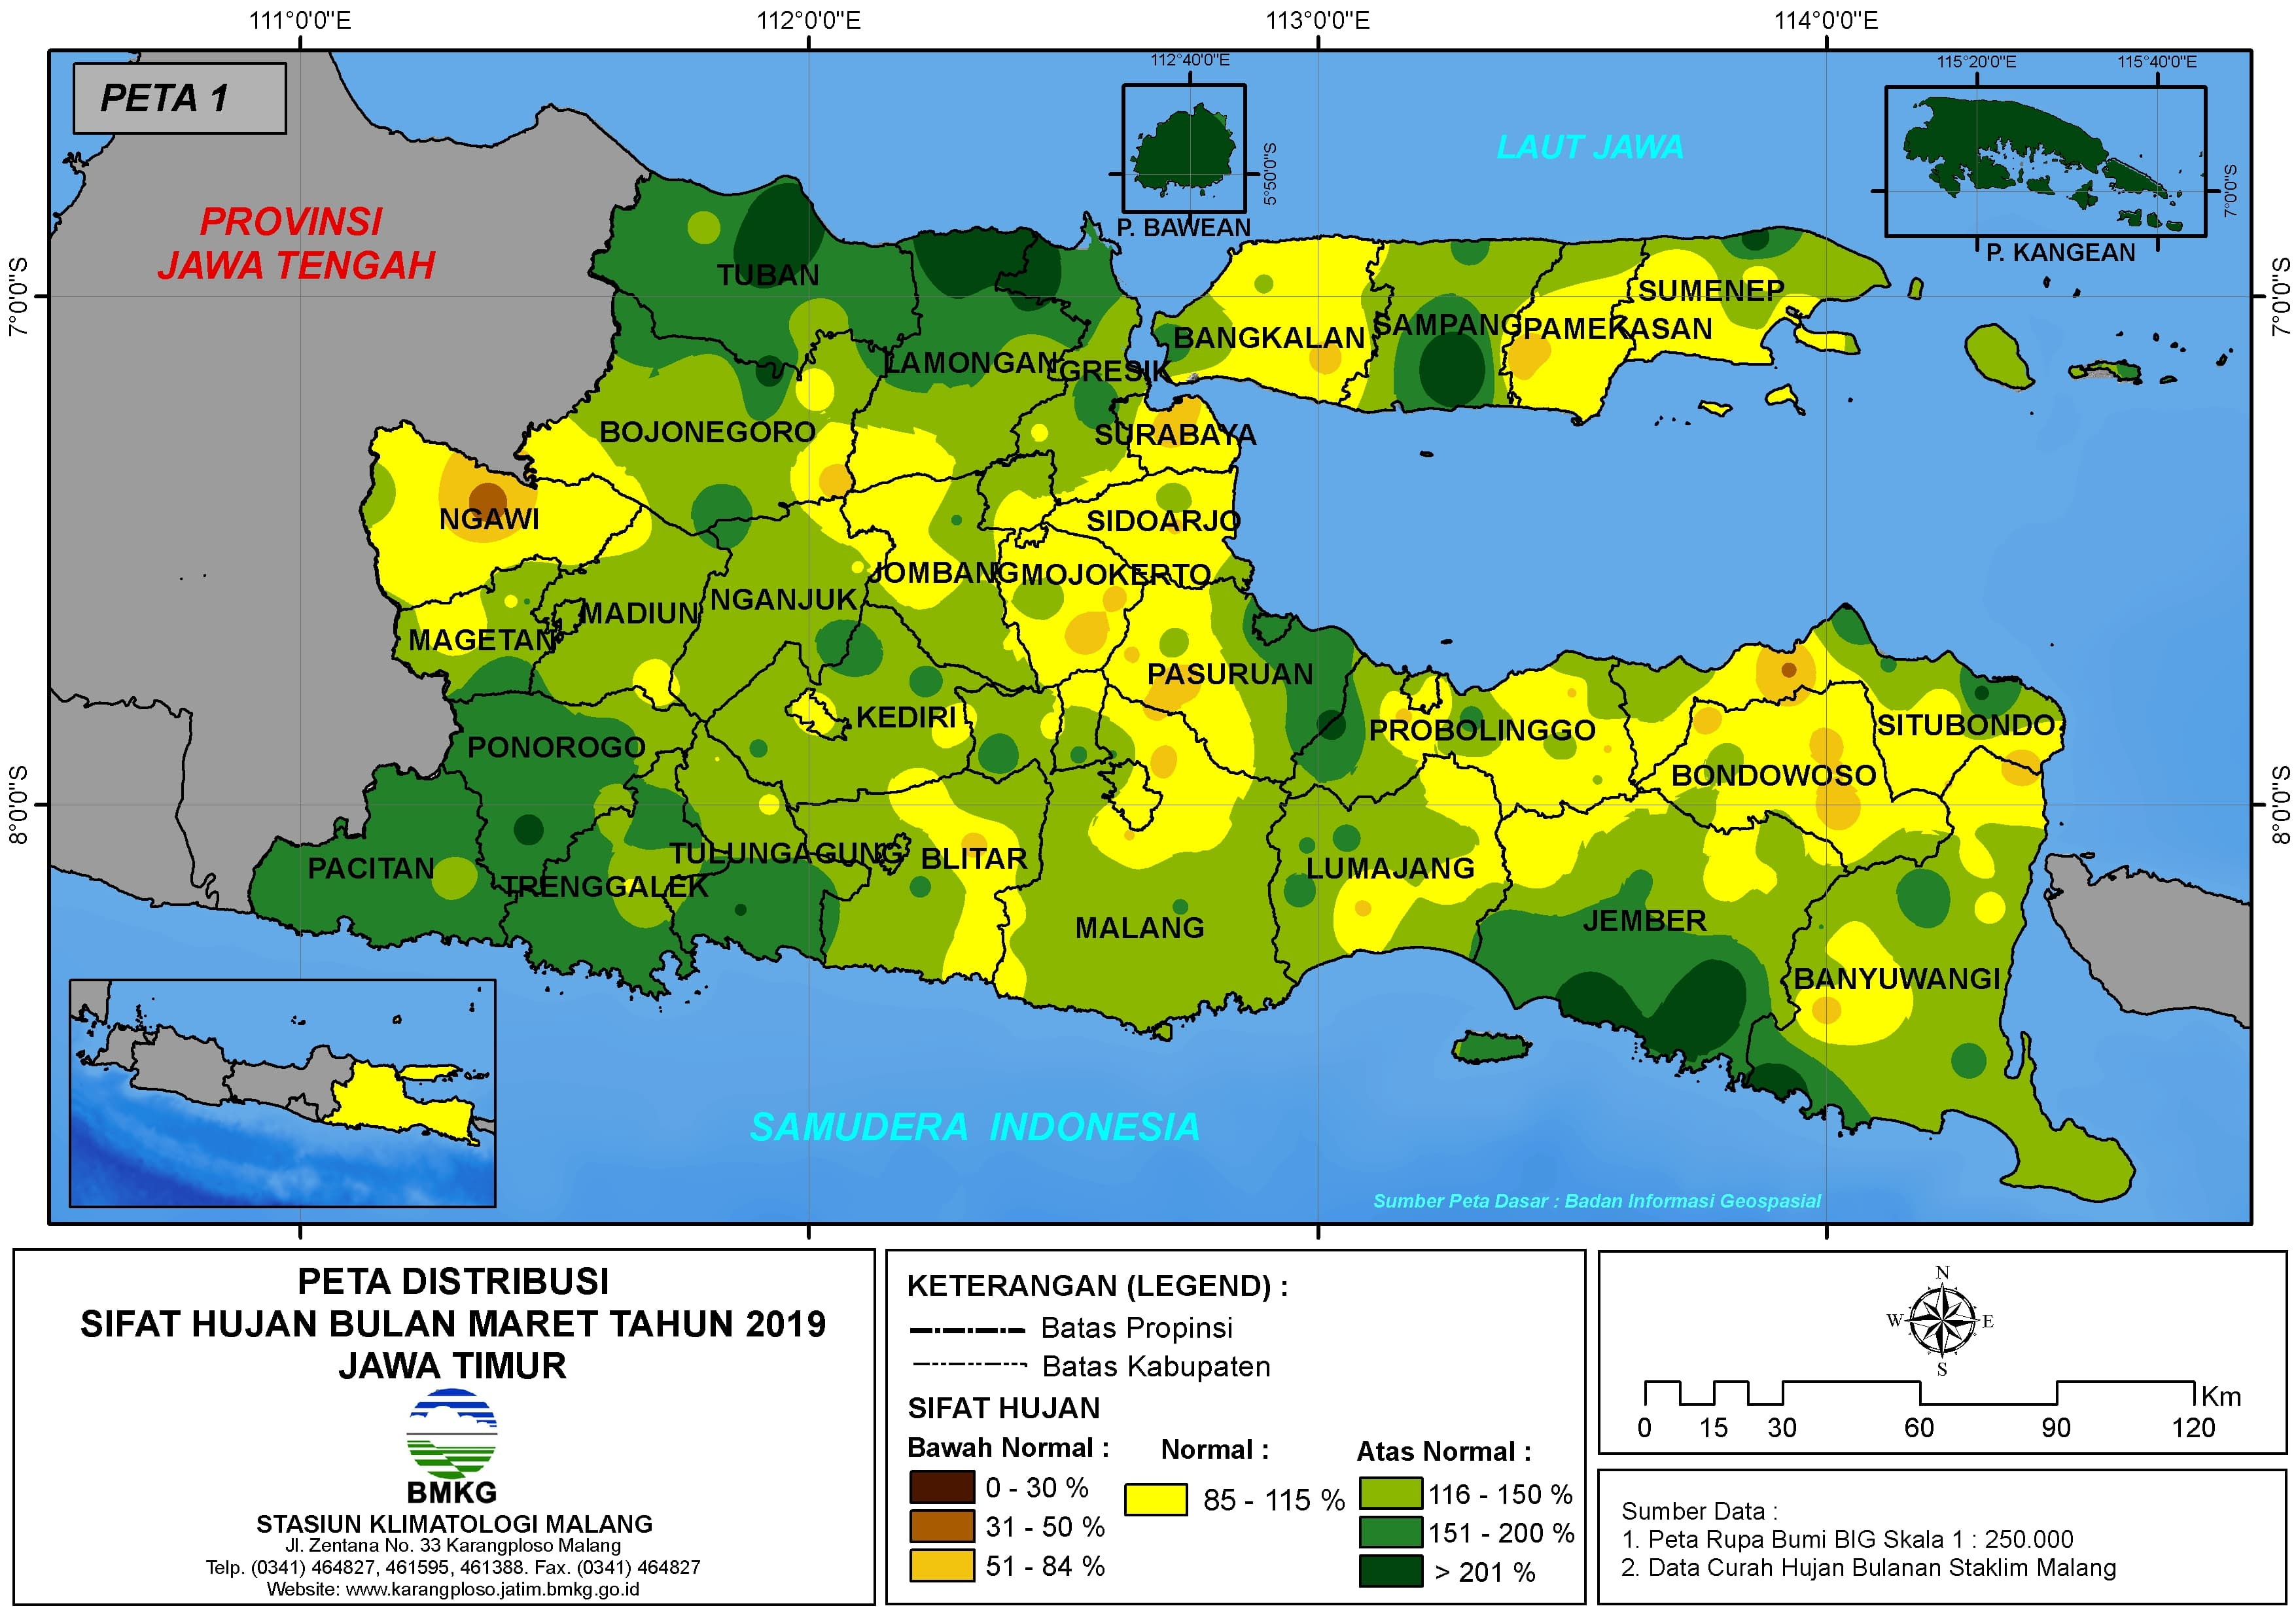 Analisis Bulanan Distribusi Sifat Hujan Bulan Maret Tahun 2019 di Provinsi Jawa Timur